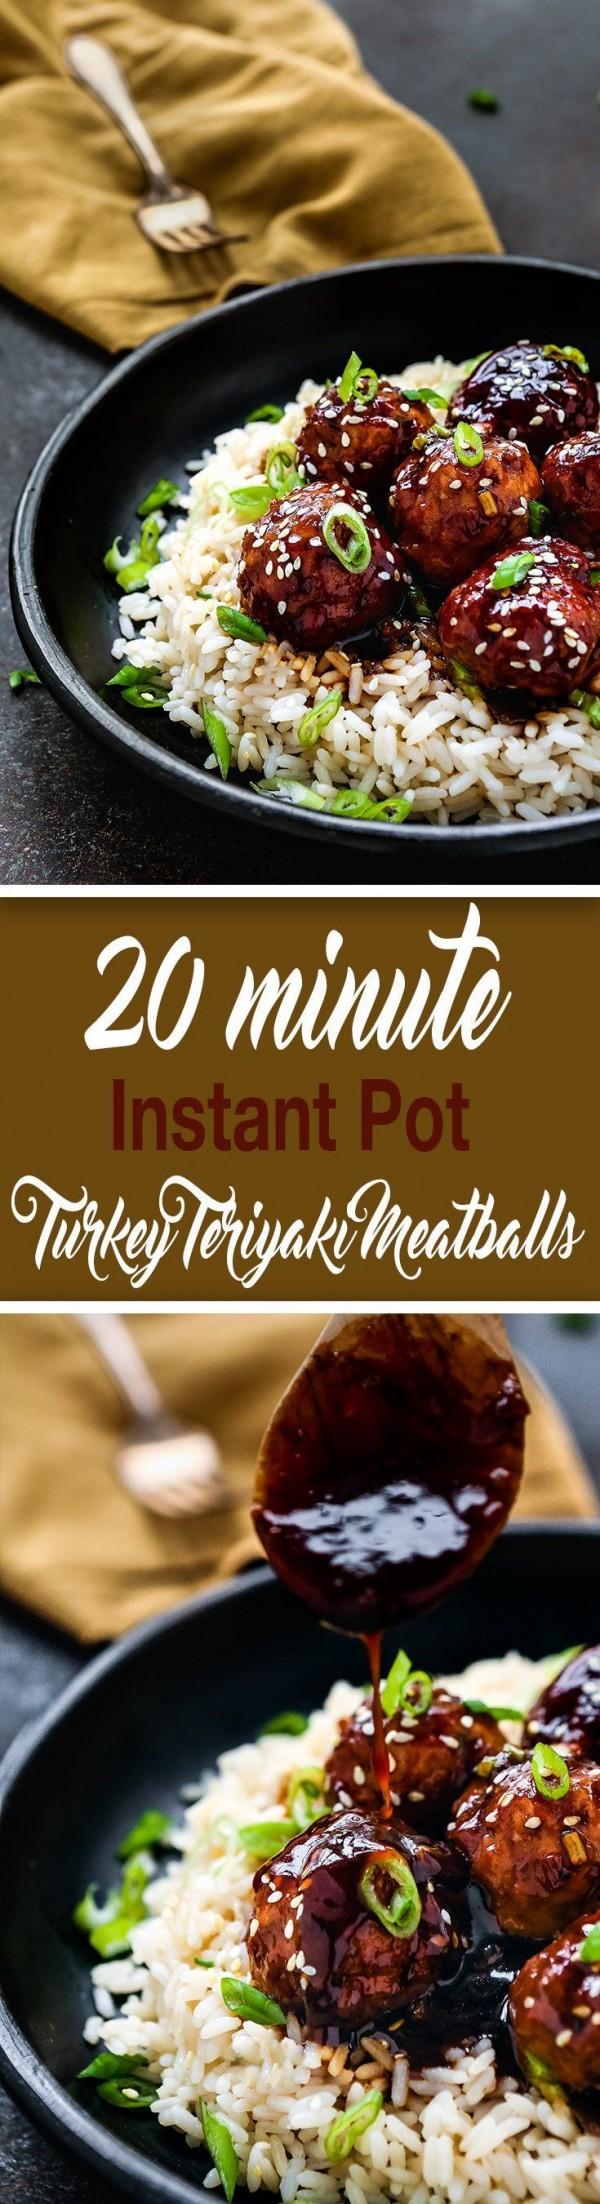 Get the recipe Turkey Teriyaki Meatballs @recipes_to_go